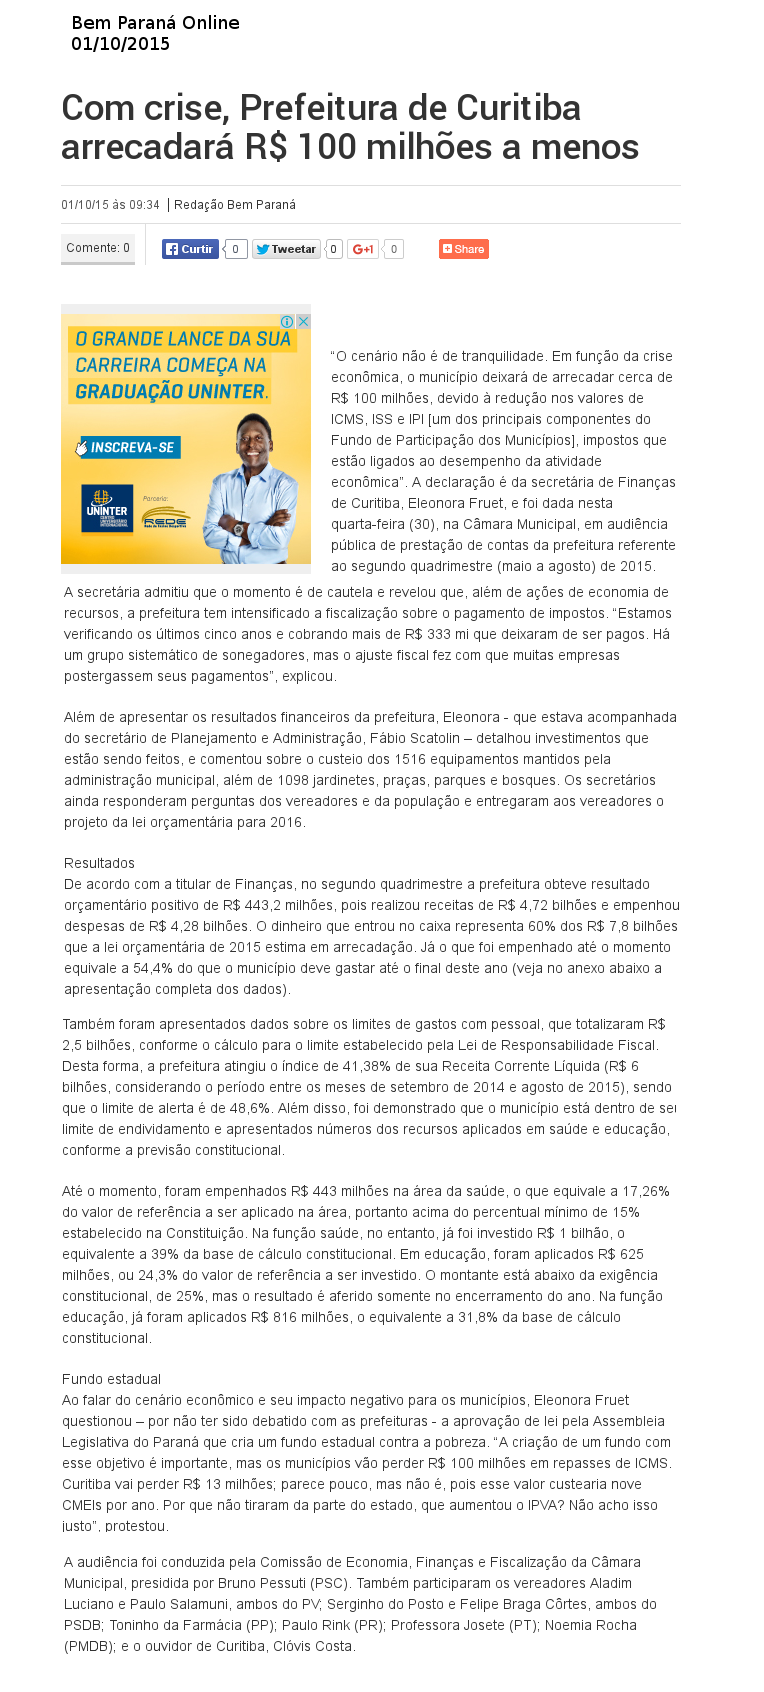 Bem Paraná Online 01.10